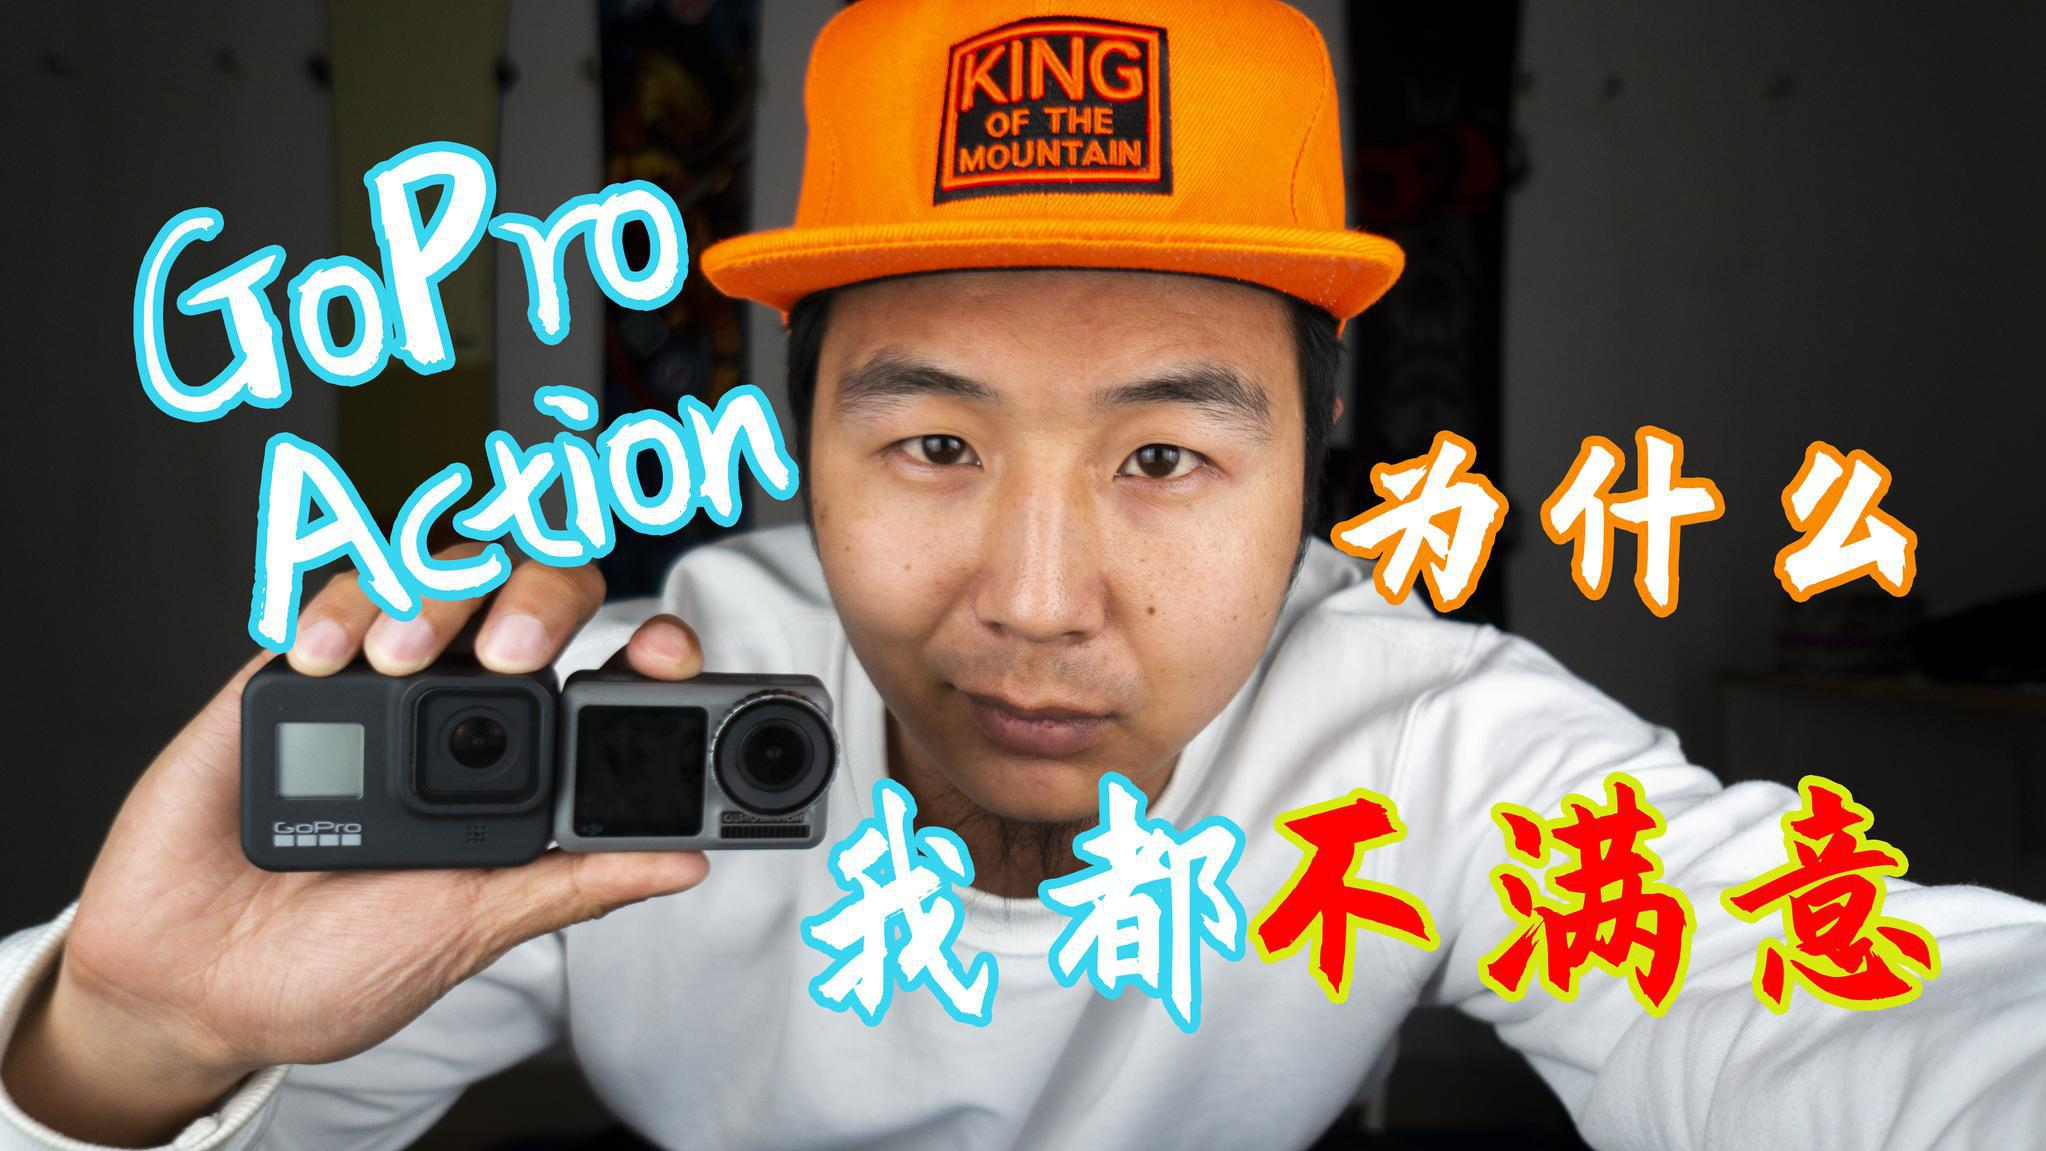 GoPro Action 为什么我都不满意